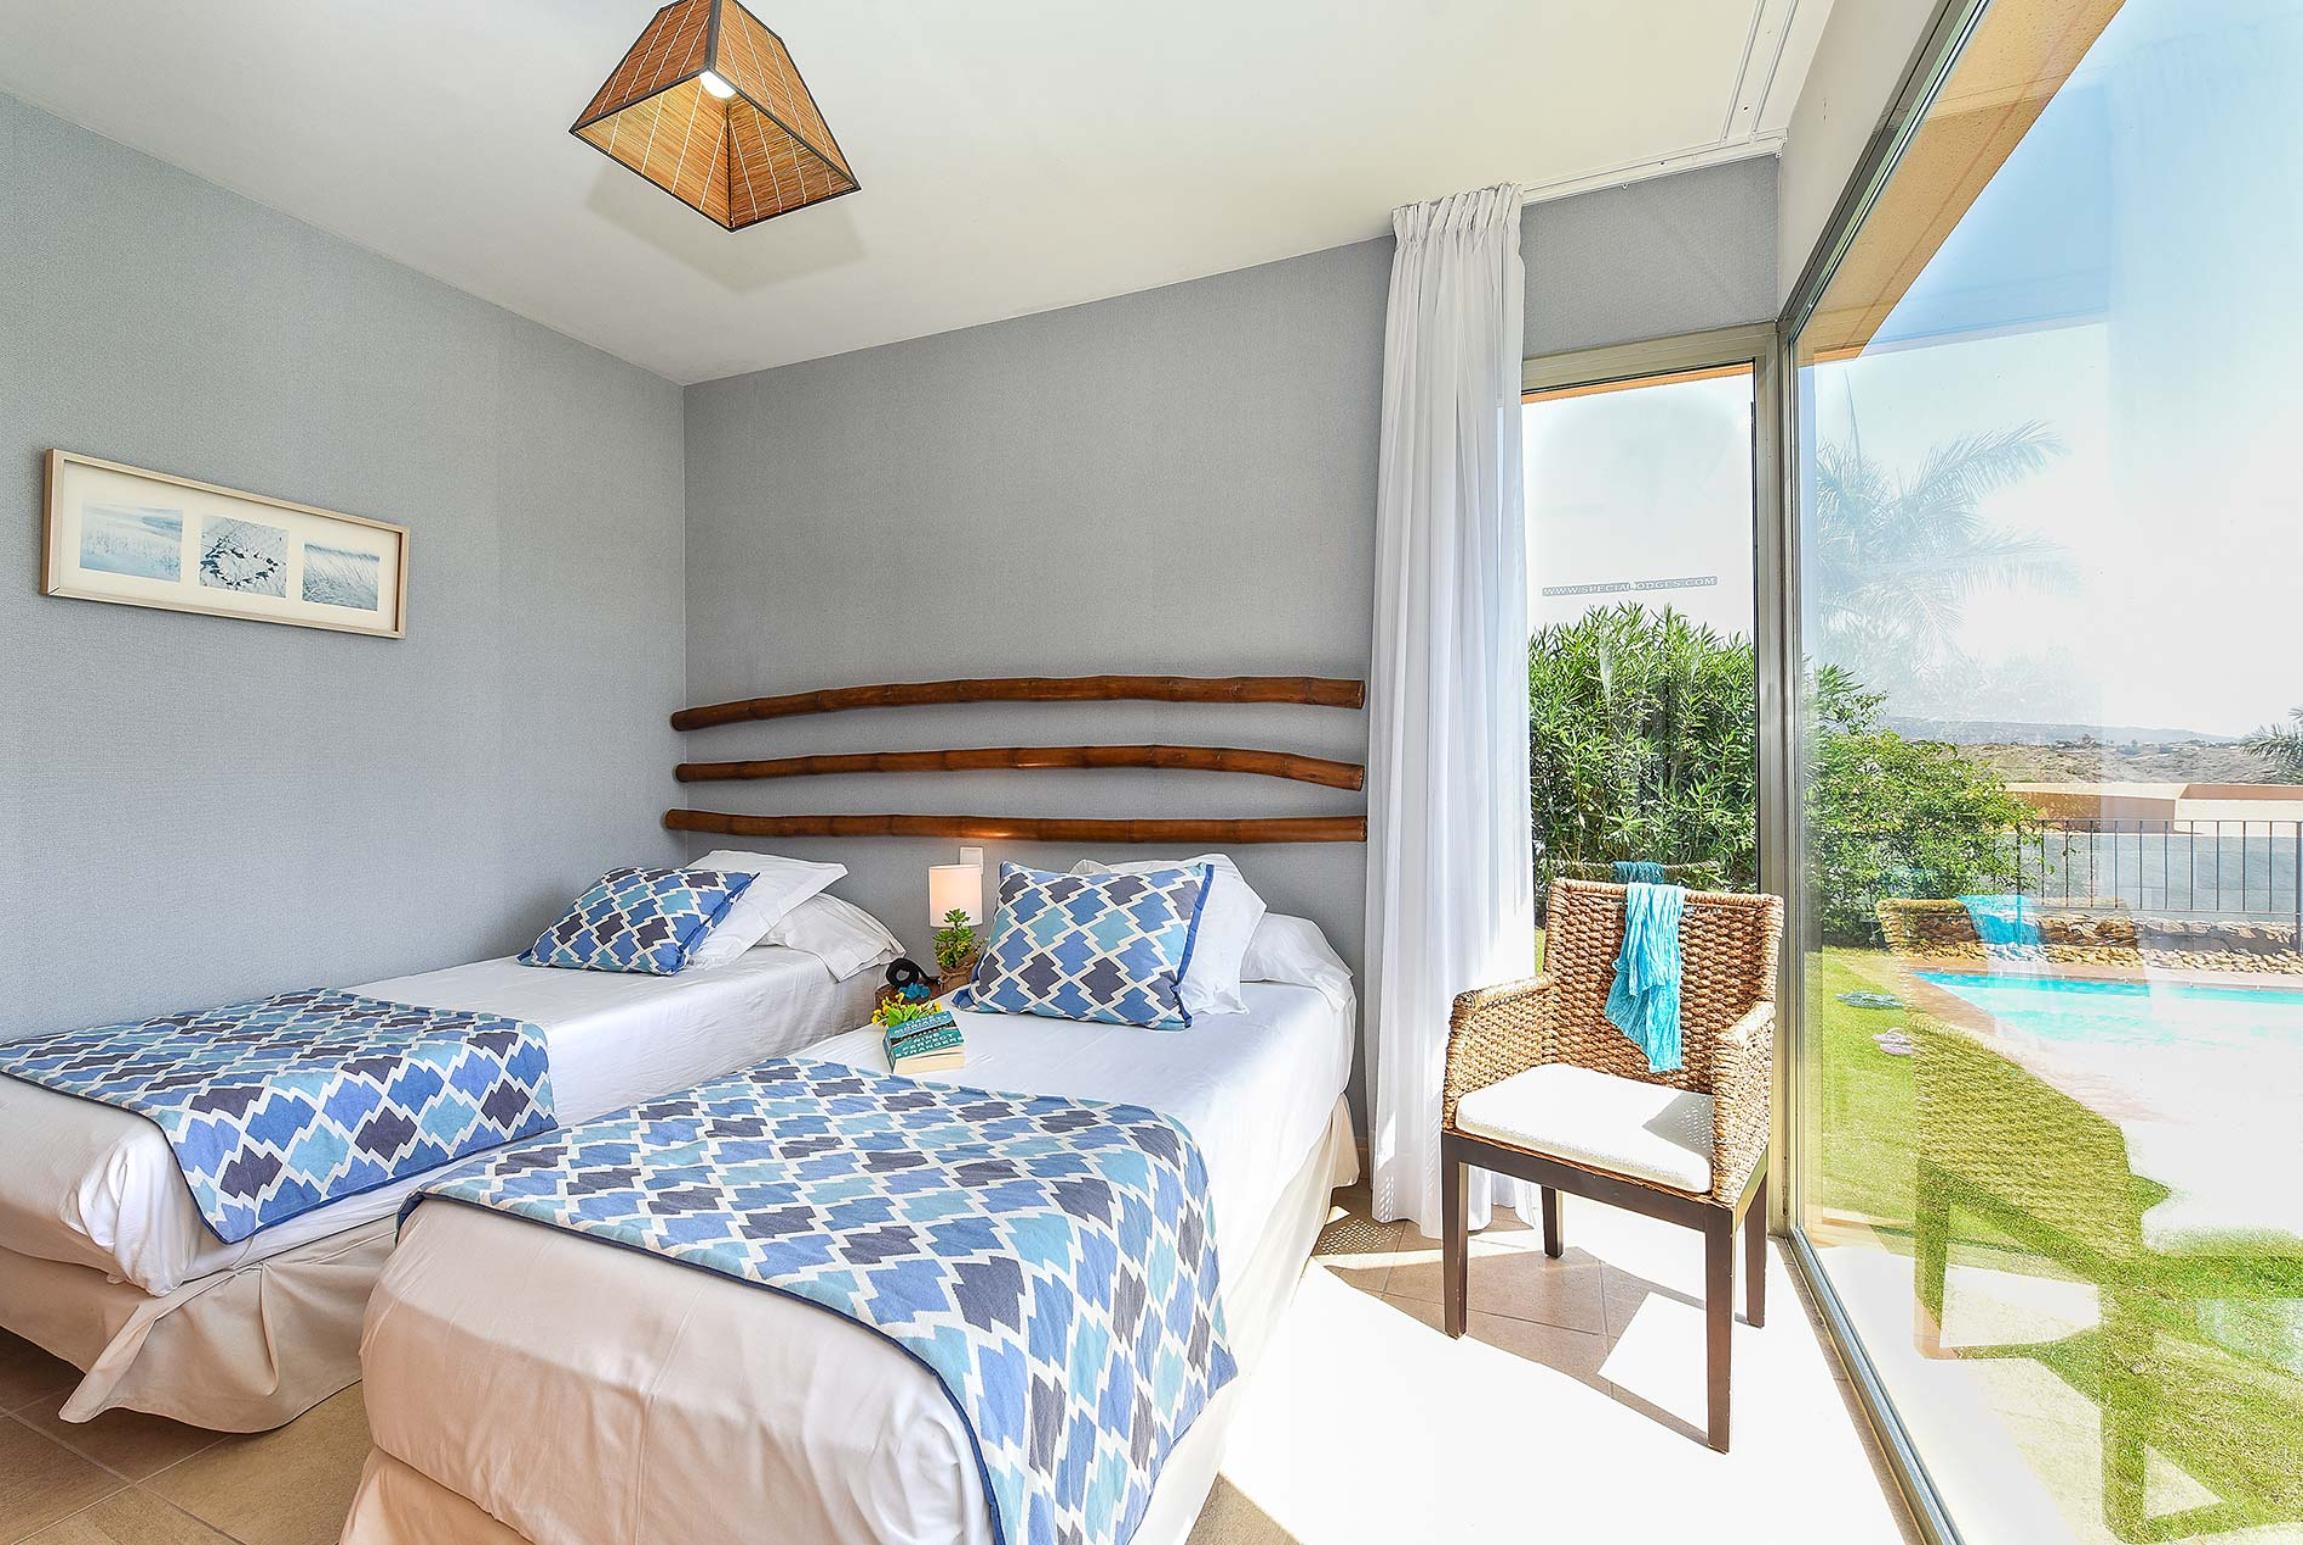 Holiday house Par 4 Villa 3 (2653981), Maspalomas, Gran Canaria, Canary Islands, Spain, picture 11